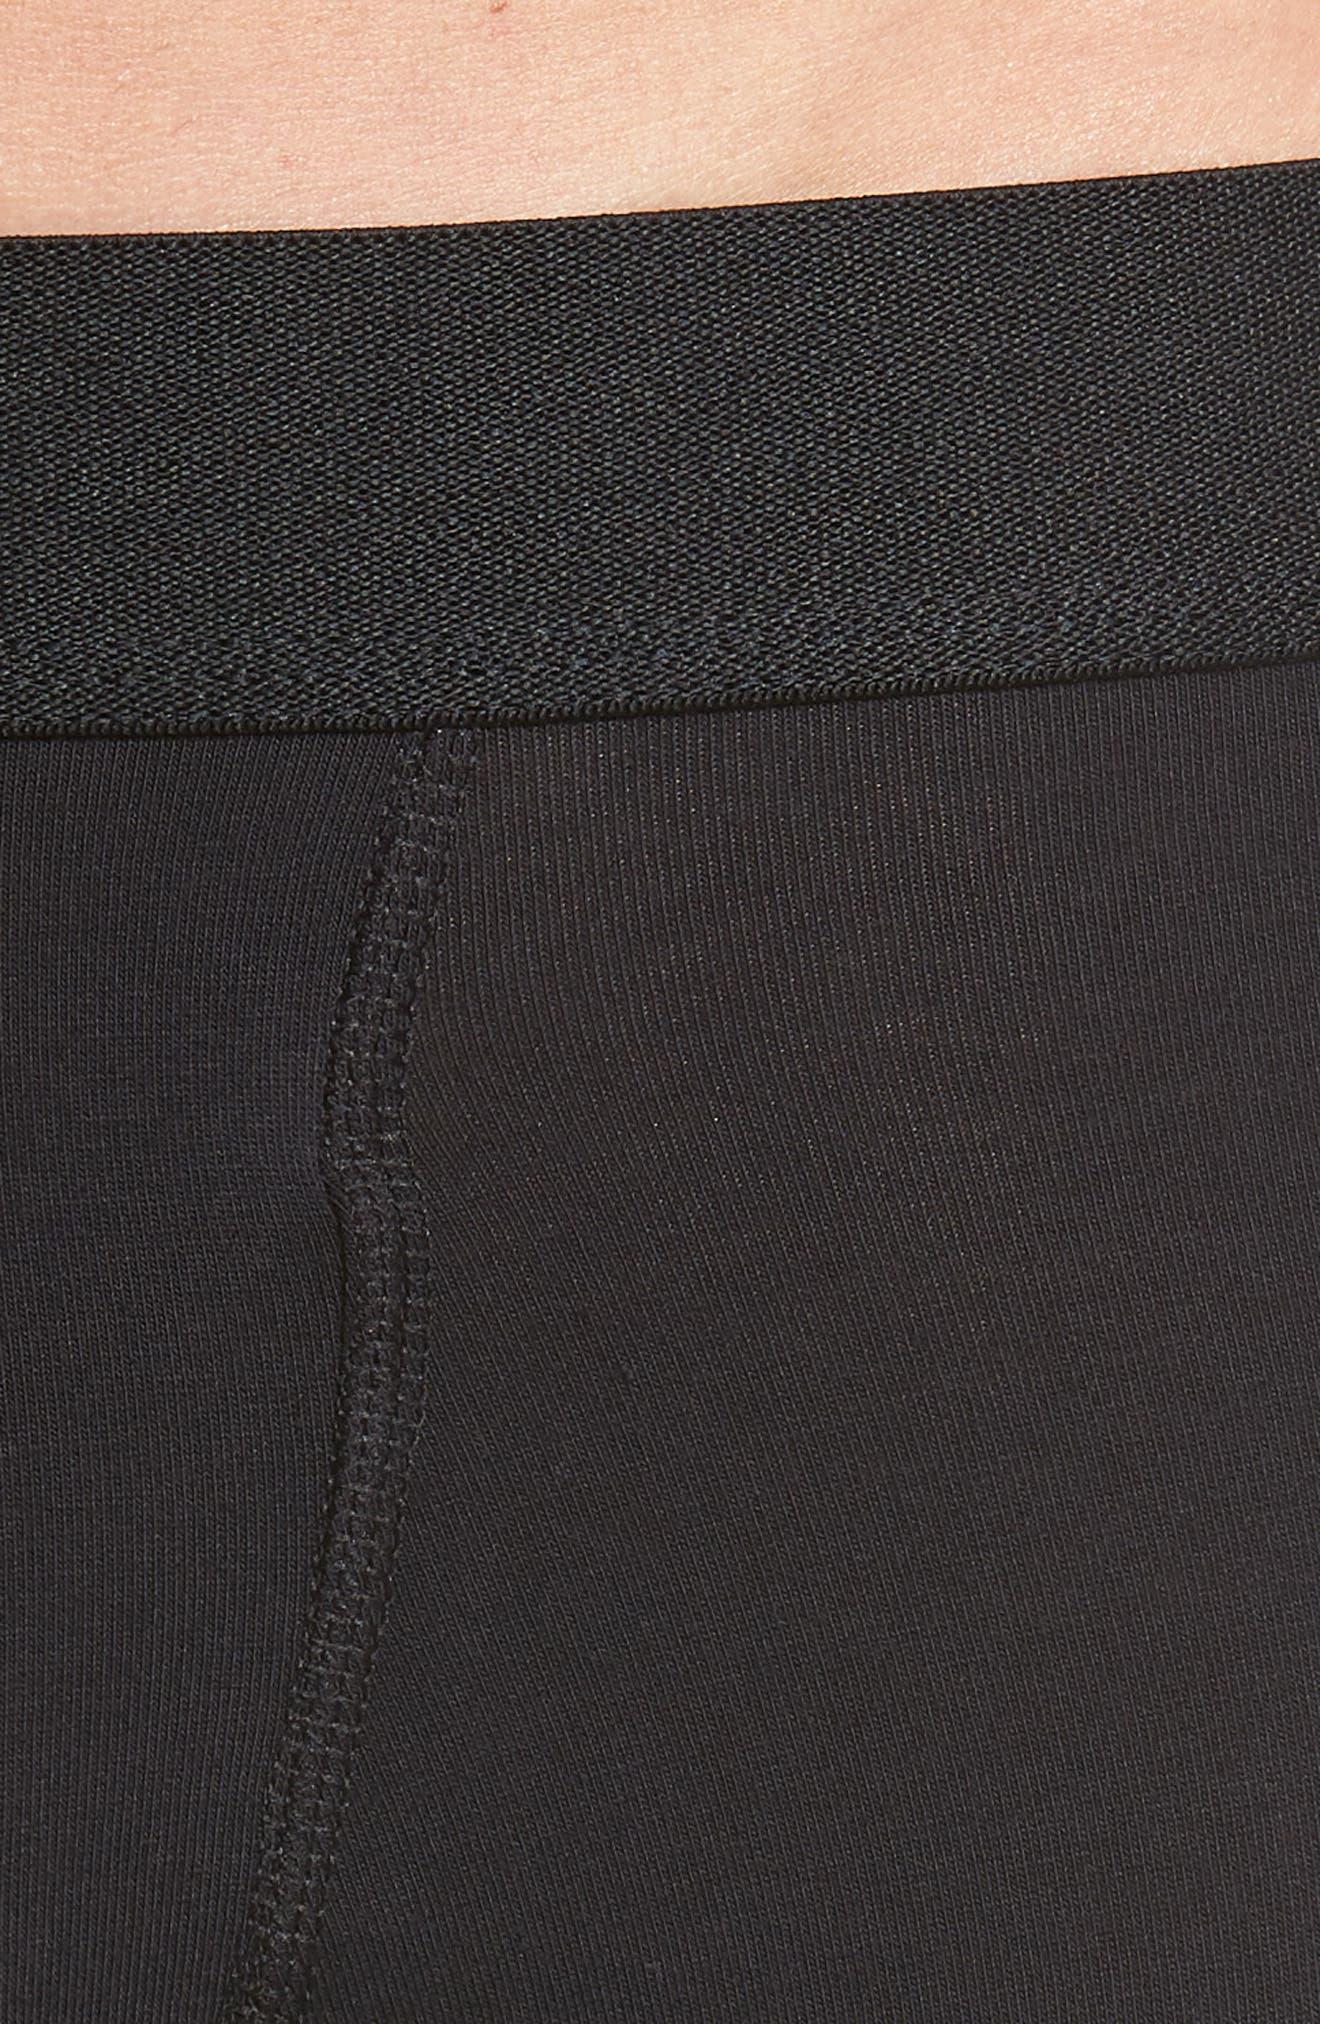 Smith Cotton Boxer Briefs,                             Alternate thumbnail 4, color,                             BLACK